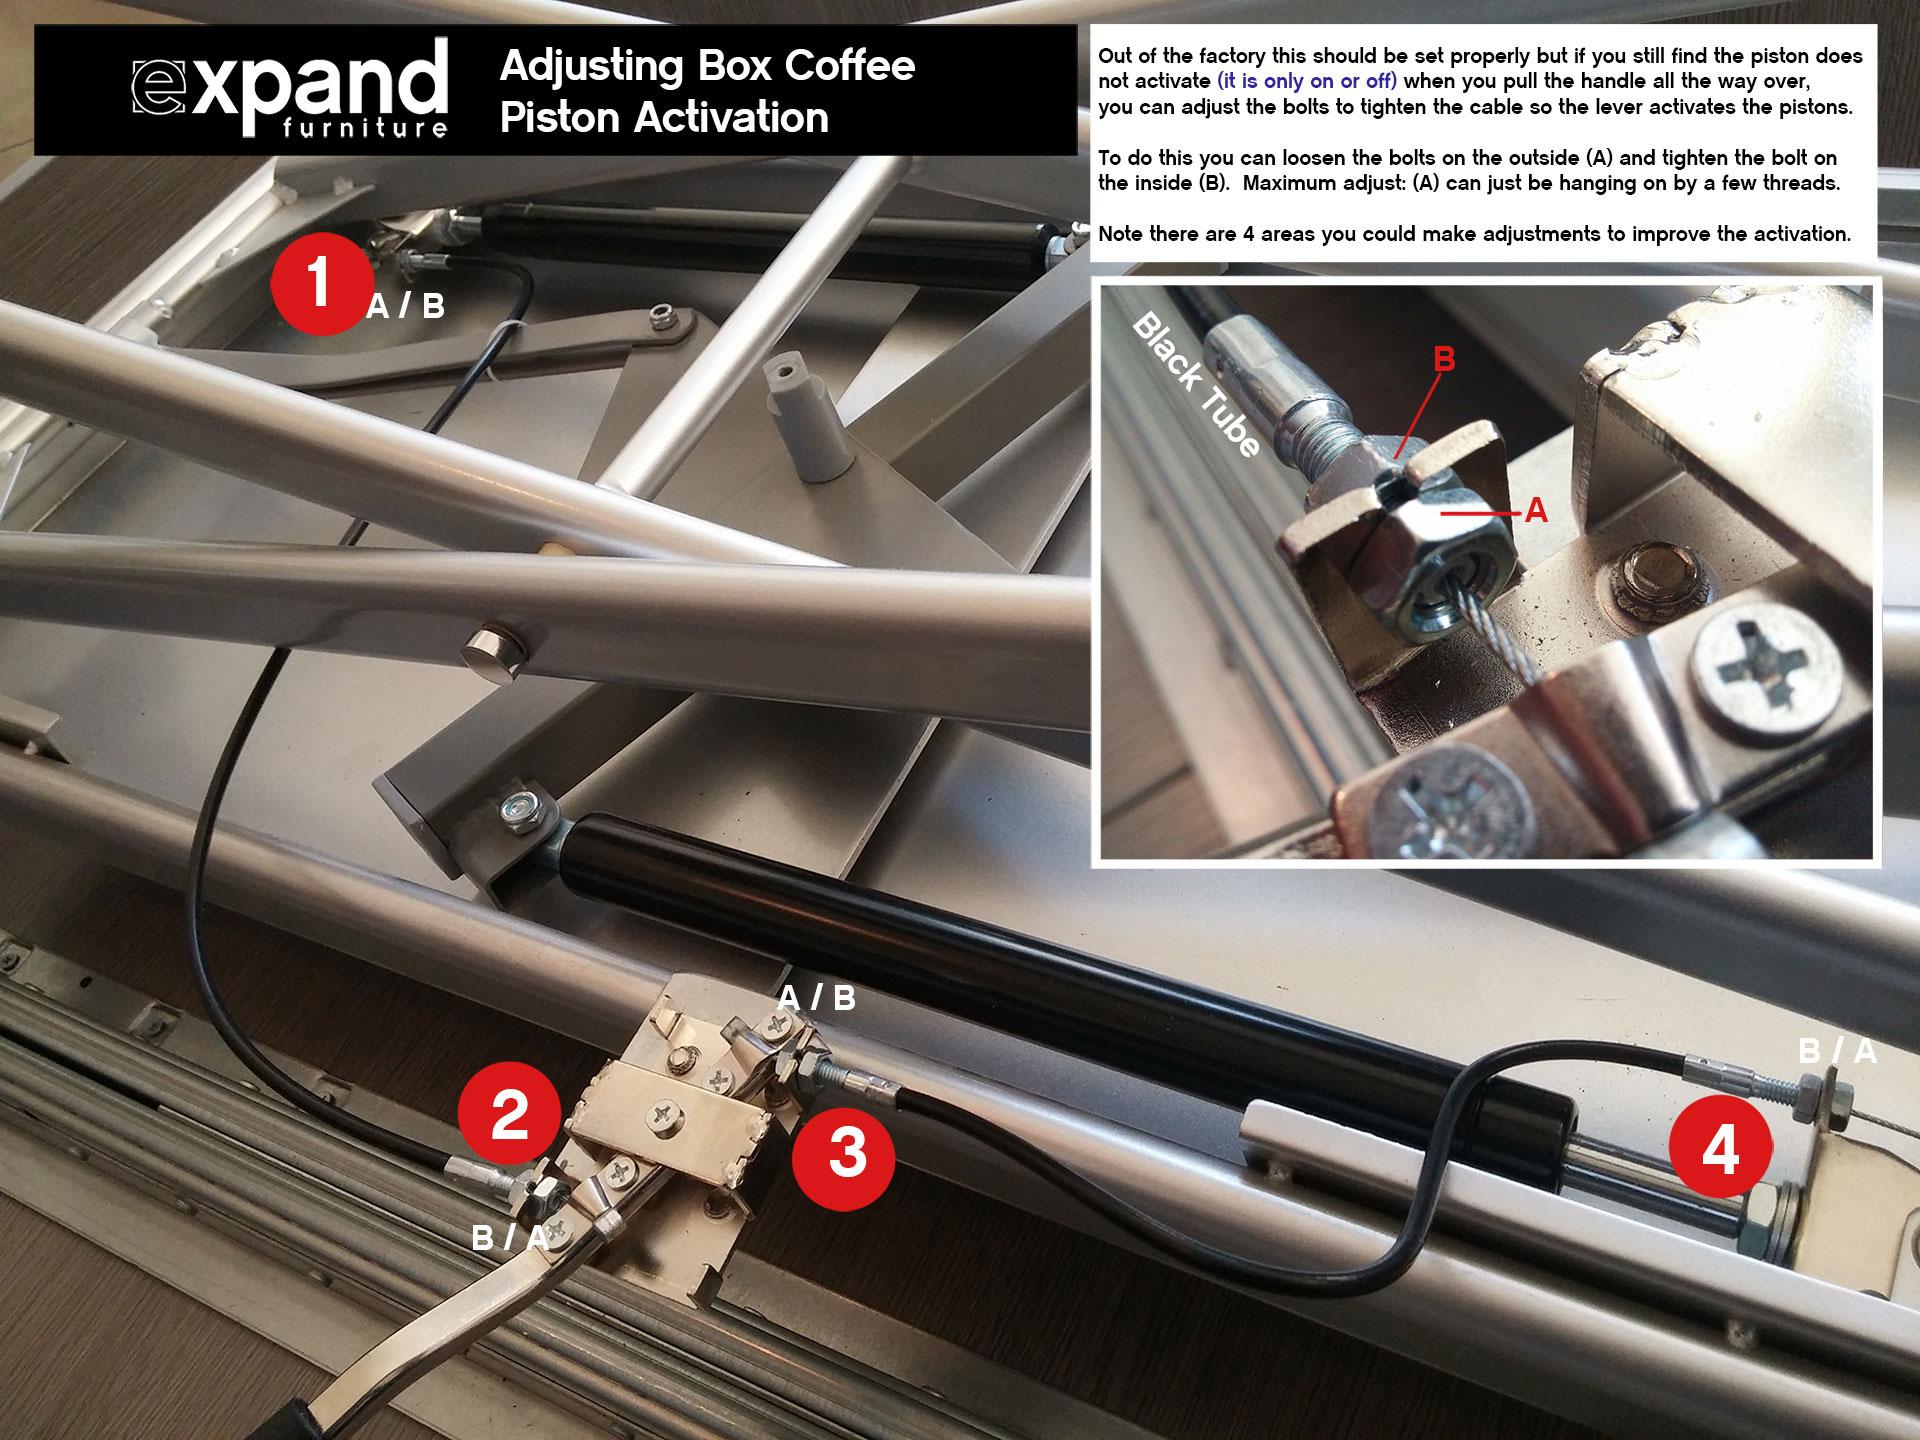 Box-Coffee-Piston-Activation-Adjustment